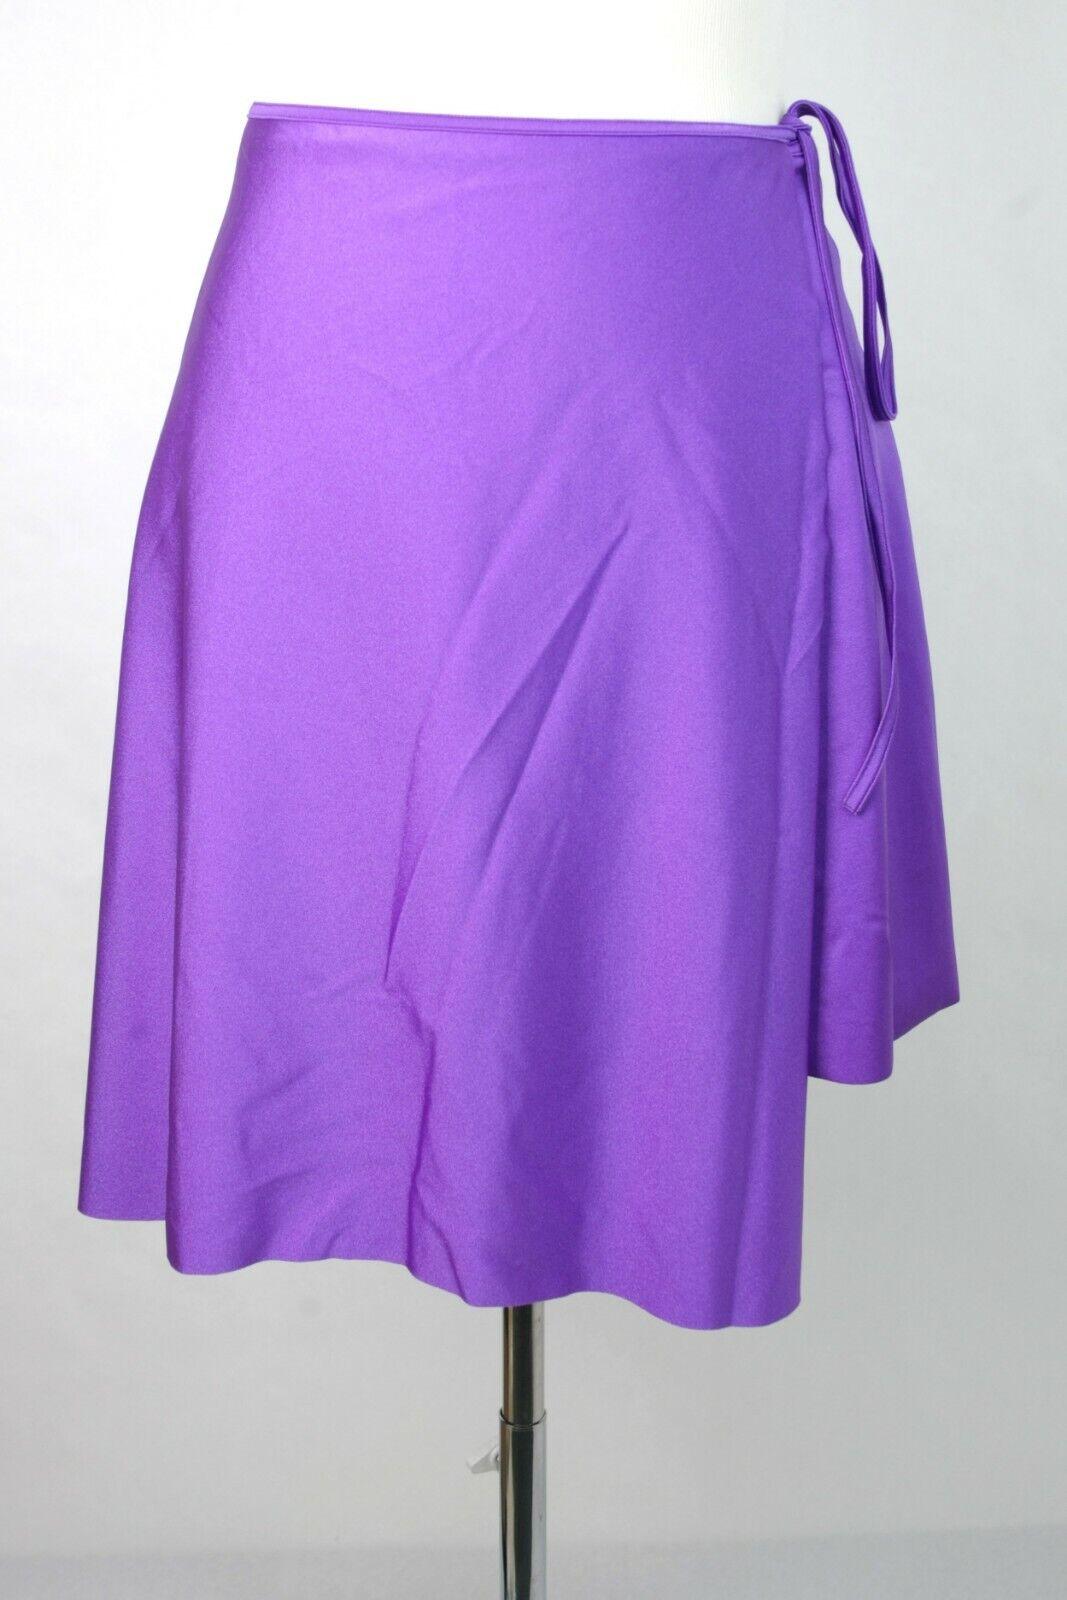 New Balenciaga Women's Purple Spandex Wrap Skirt 38 470936 5100